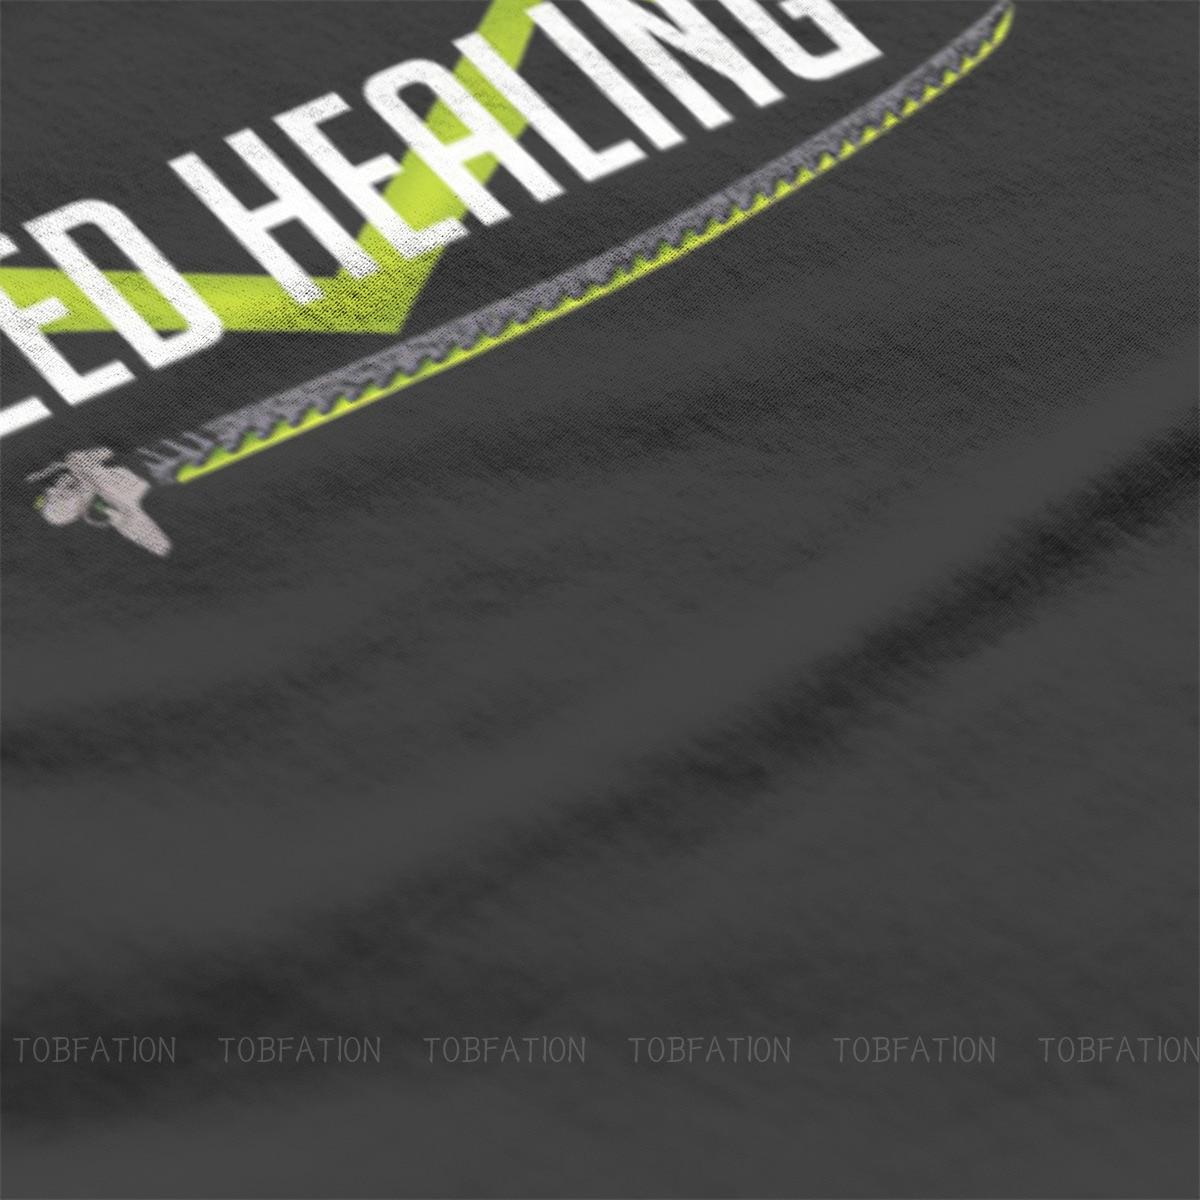 I need healing O Neck TShirt Overwatch Fabric Basic T Shirt Man's Tops New Design Oversized 1